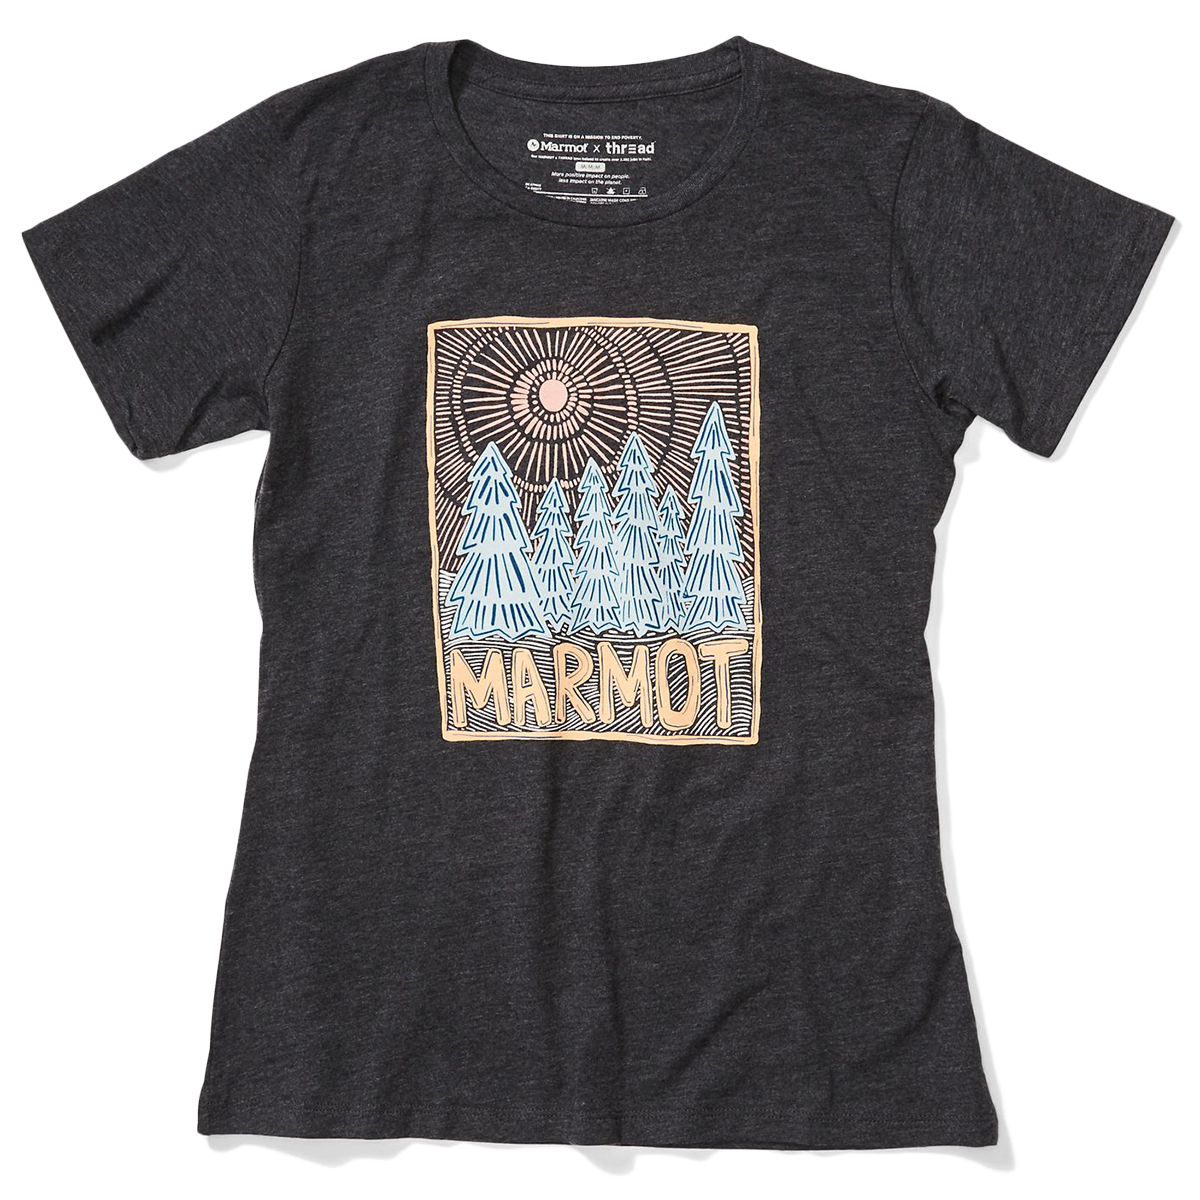 Marmot Women's Woodblock Short-Sleeve Tee - Black, S